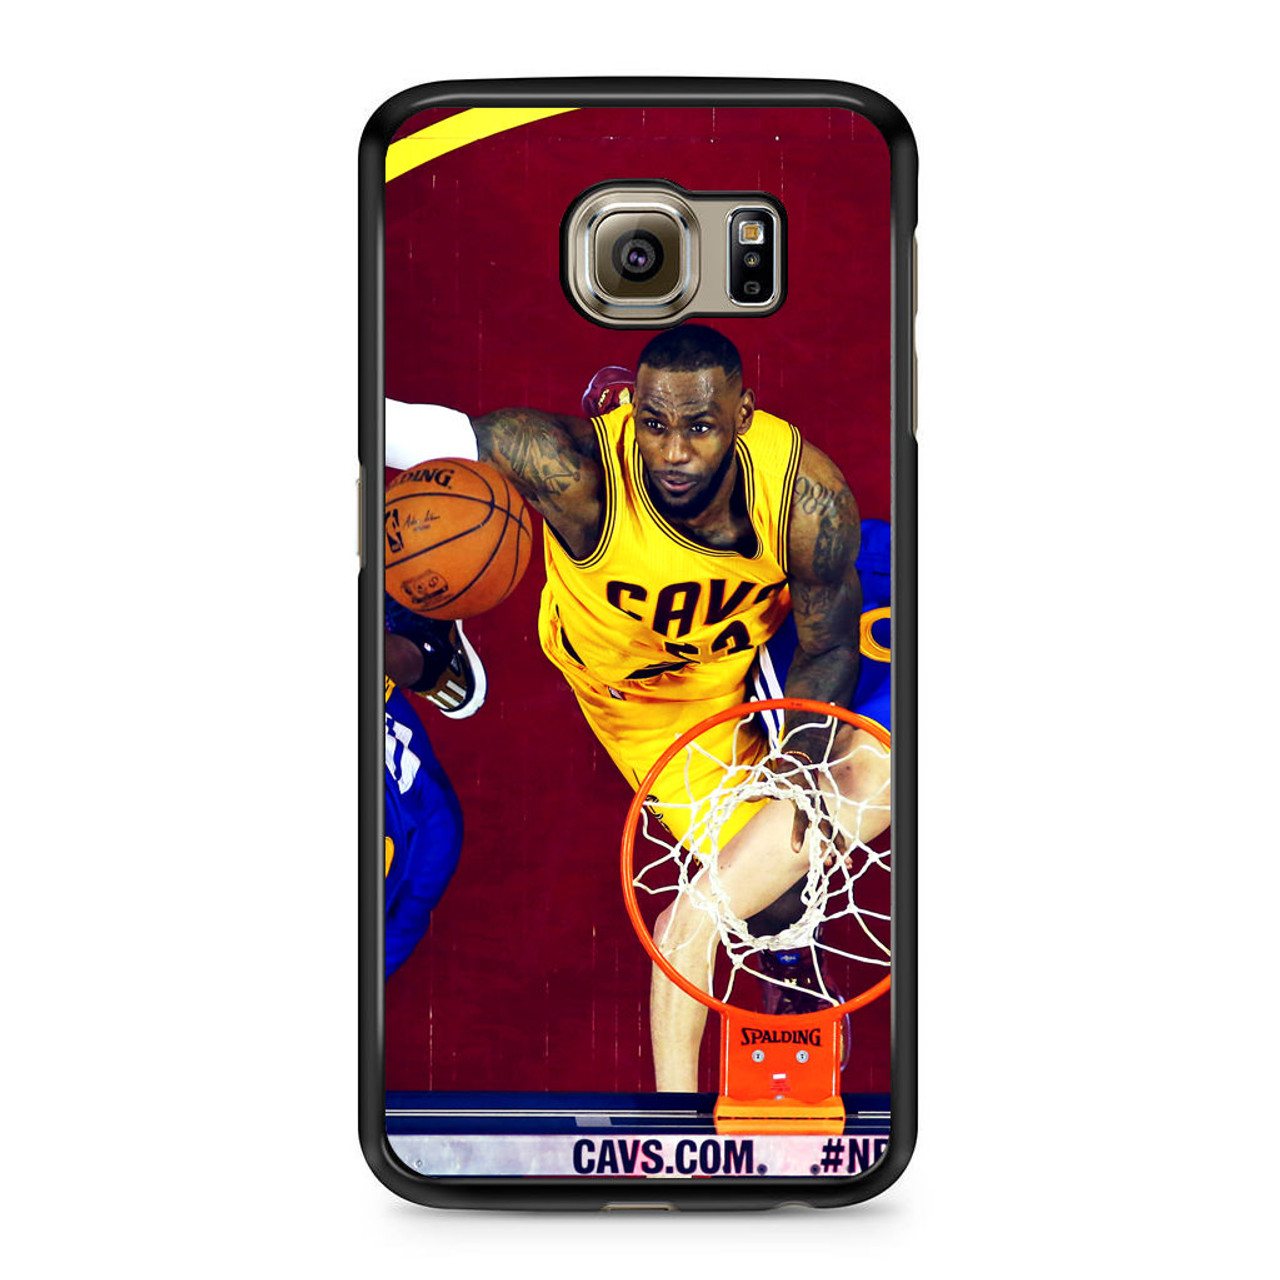 quality design 031cd b551c Lebron James Nba Basketball Rebound Samsung Galaxy S6 Case